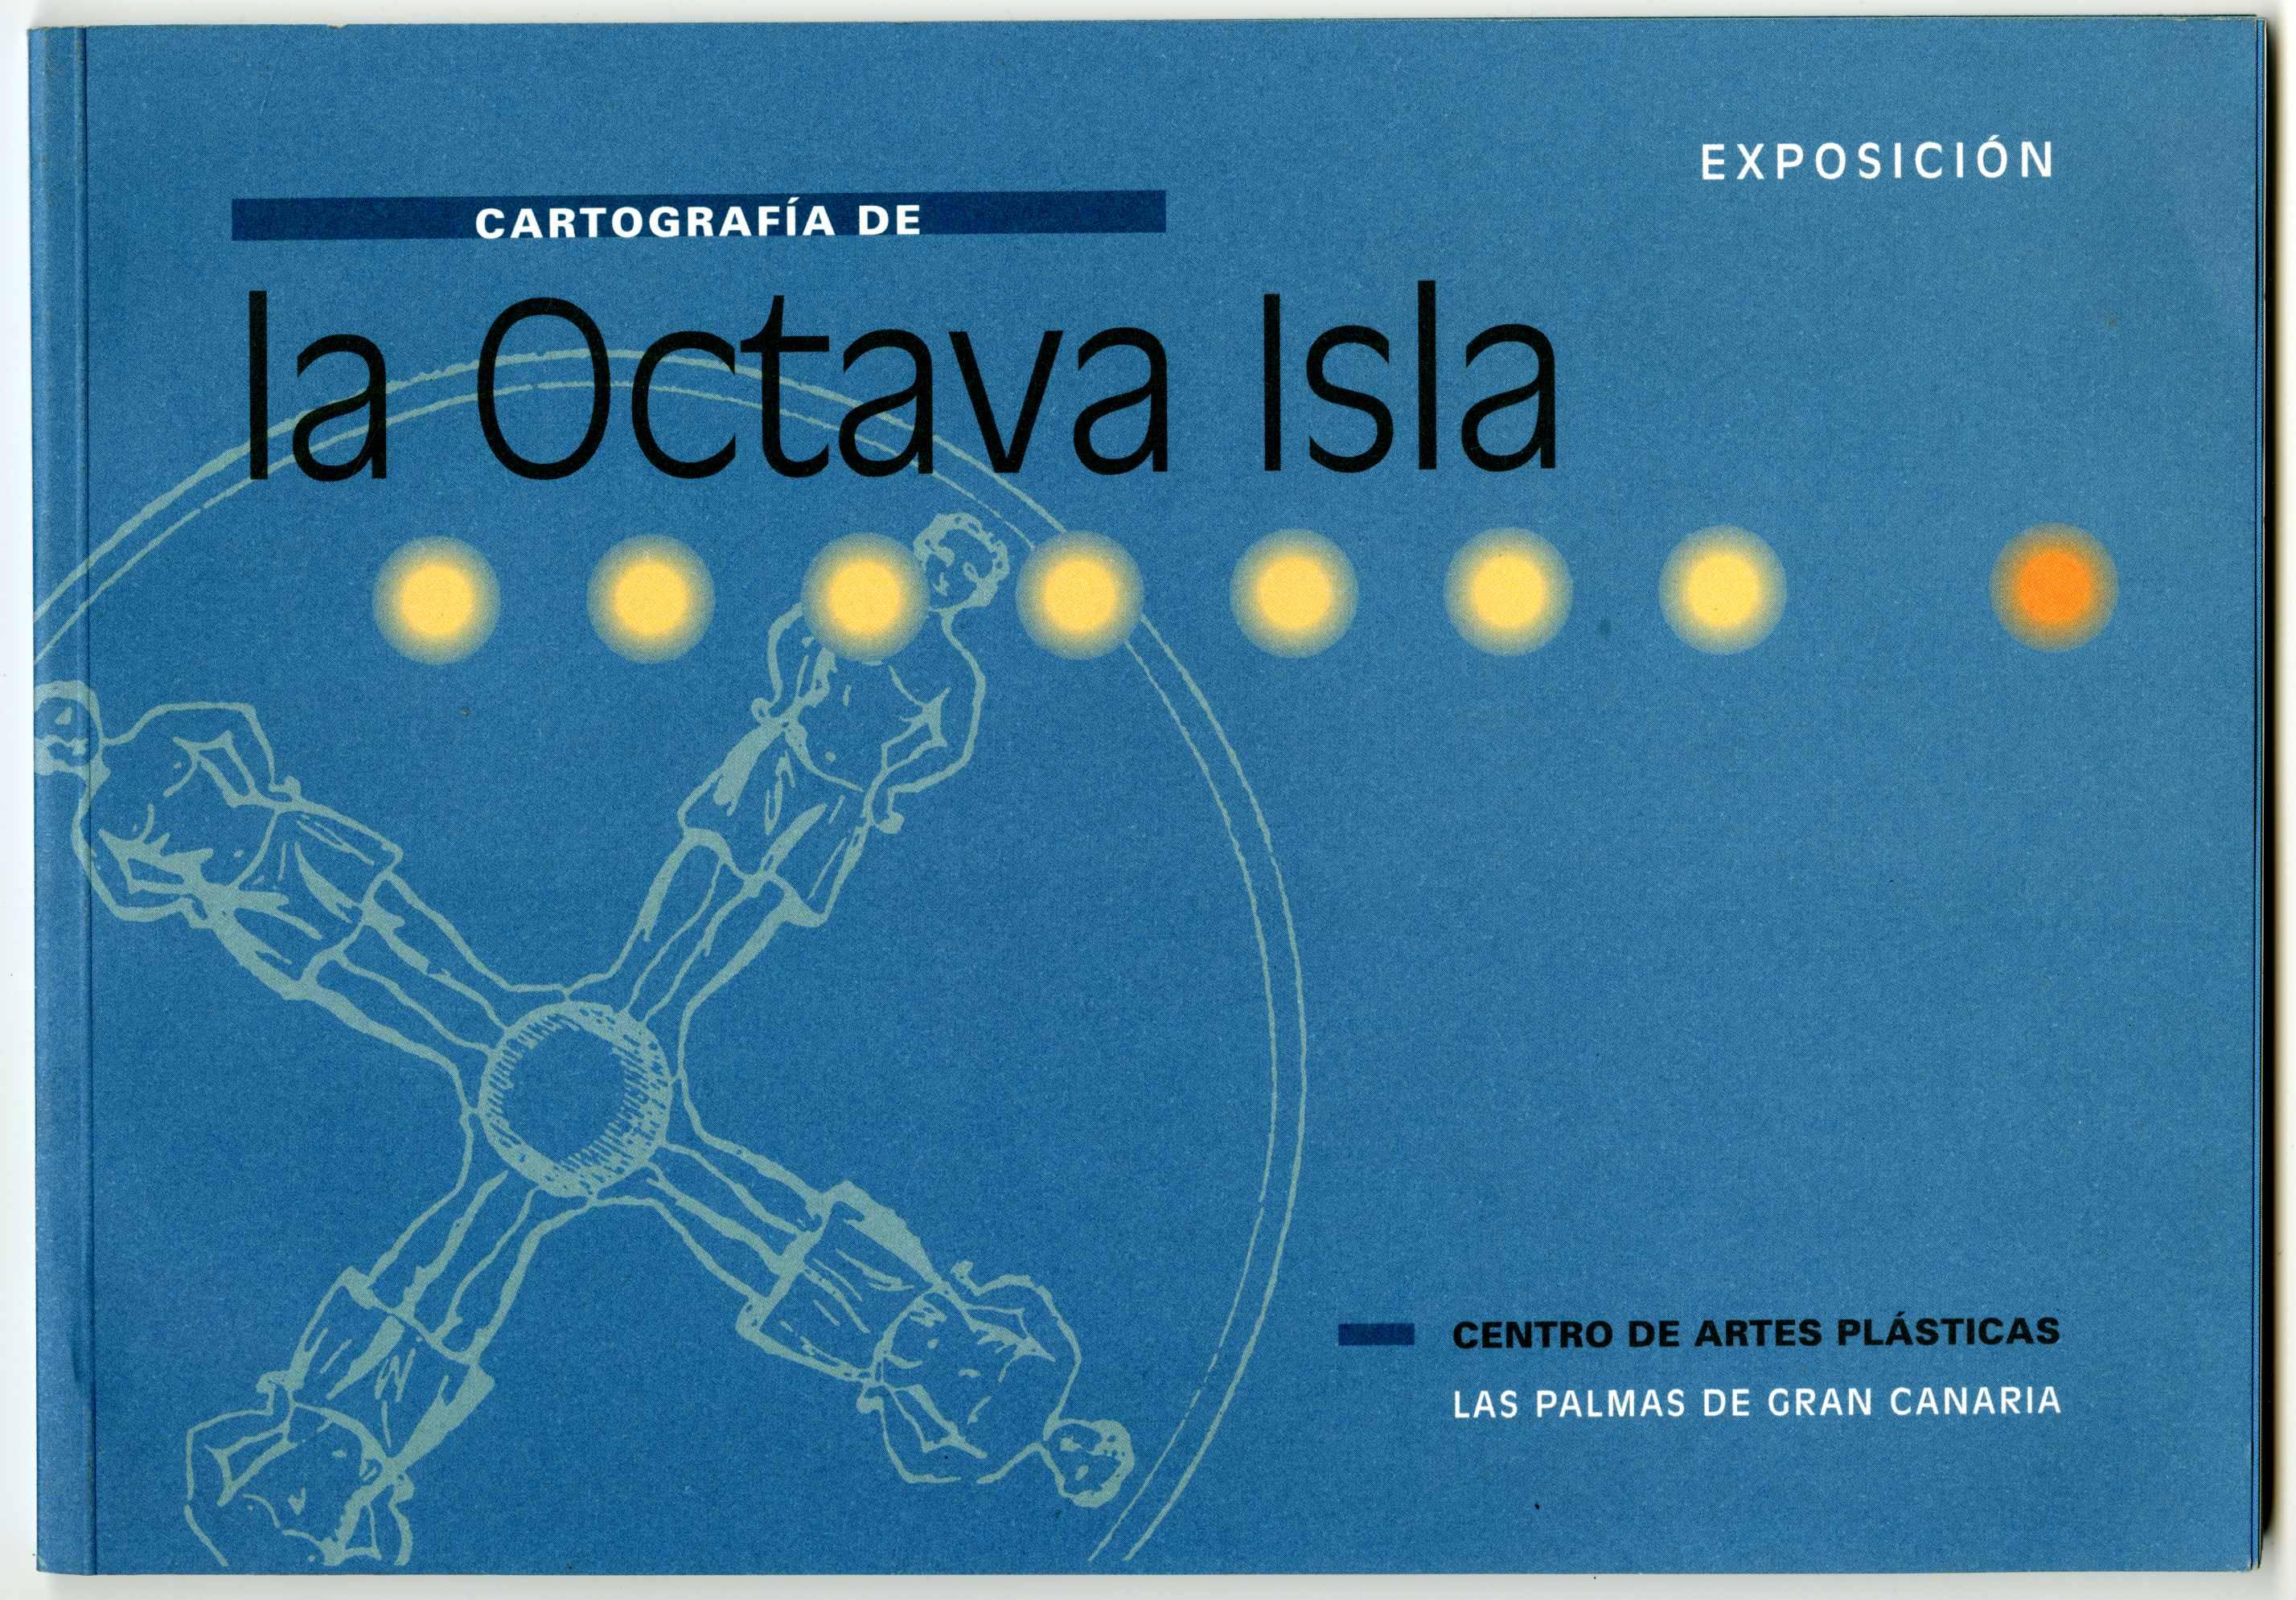 CARTOGRAFIA DE LA OCTAVA ISLA